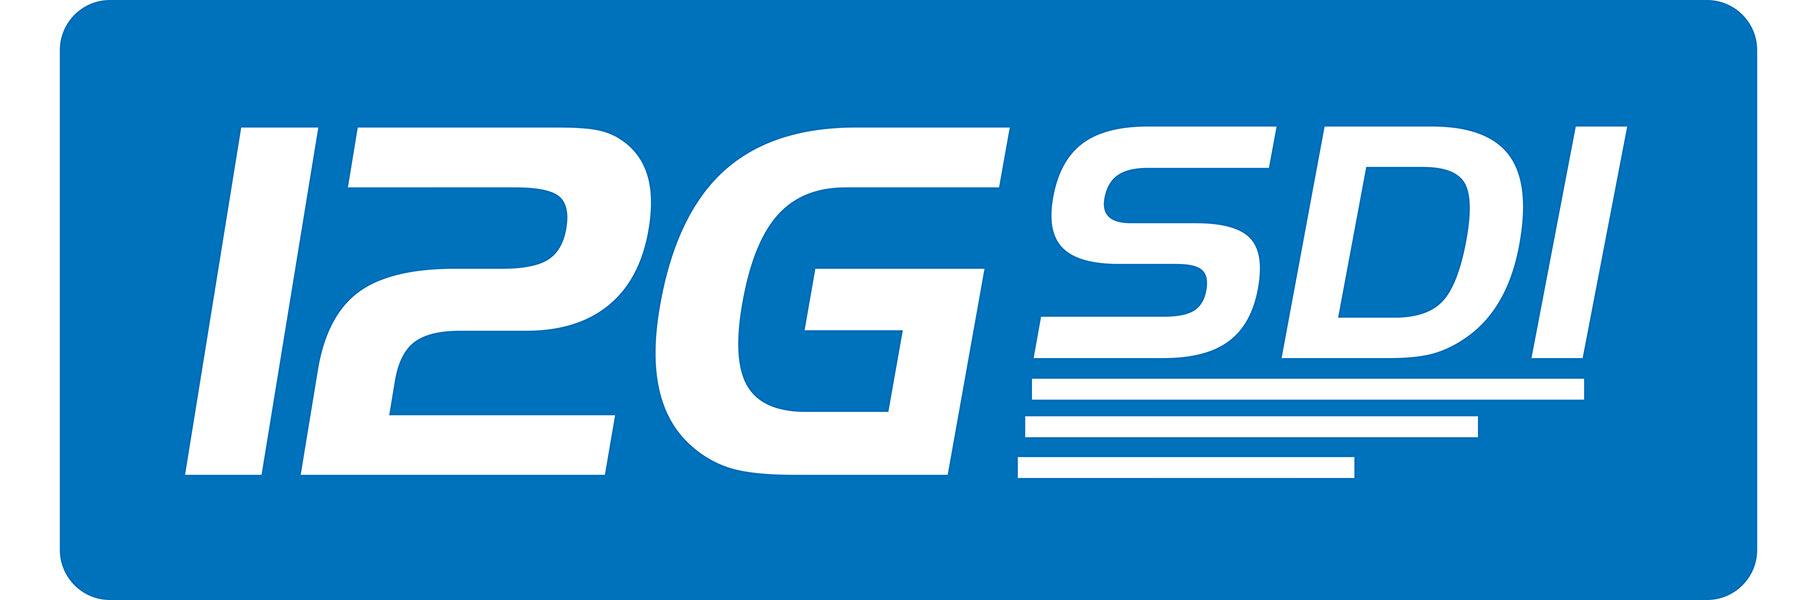 12G SDI标识